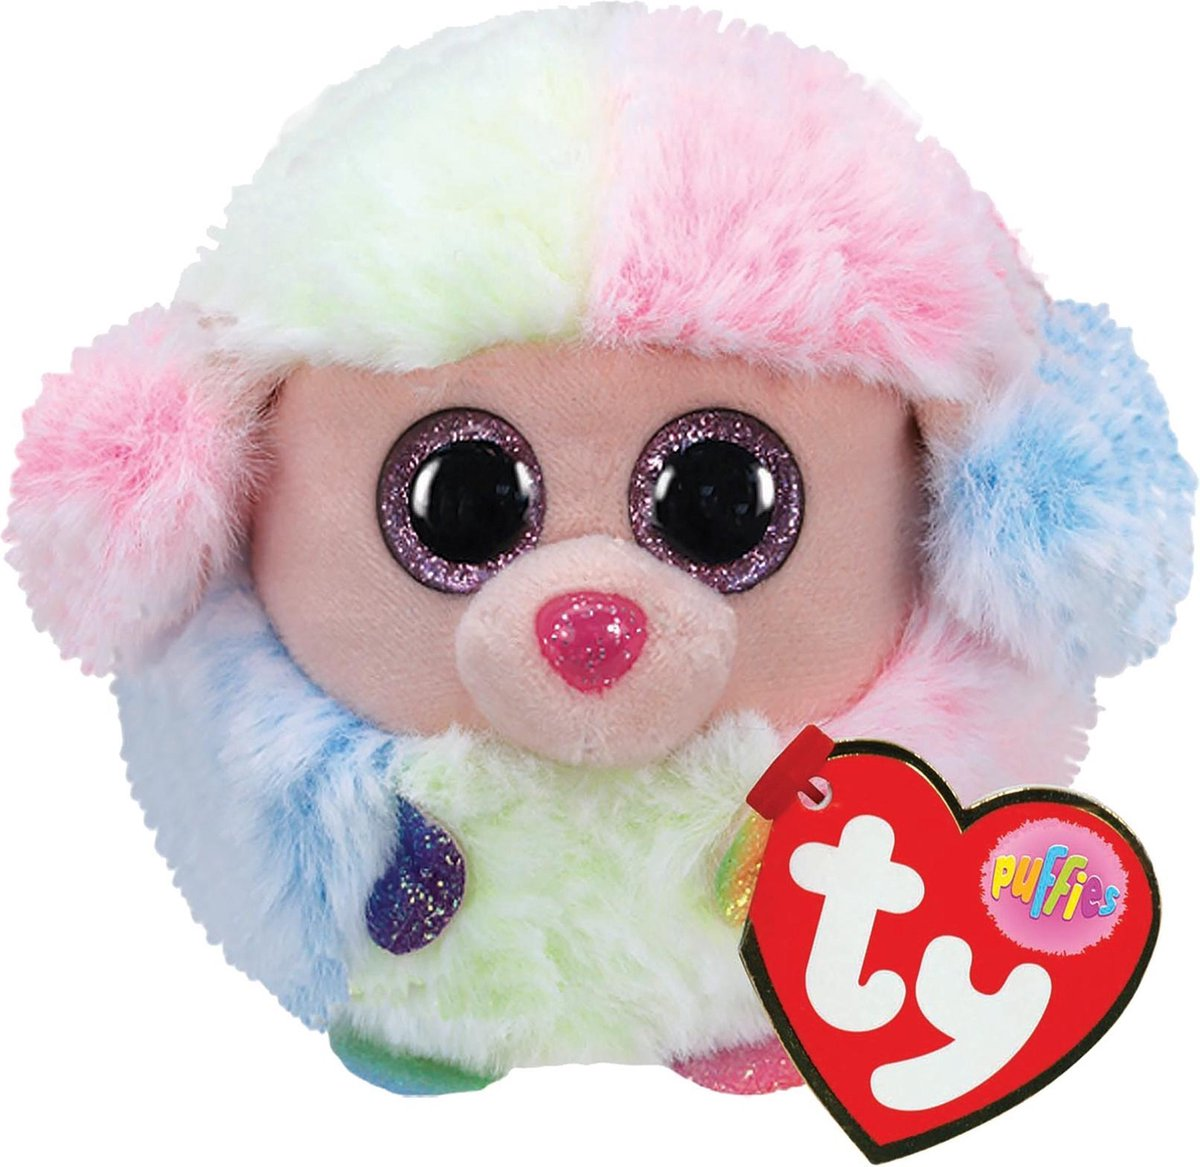 TY Puffies Knuffel Poedel Rainbow 8 cm